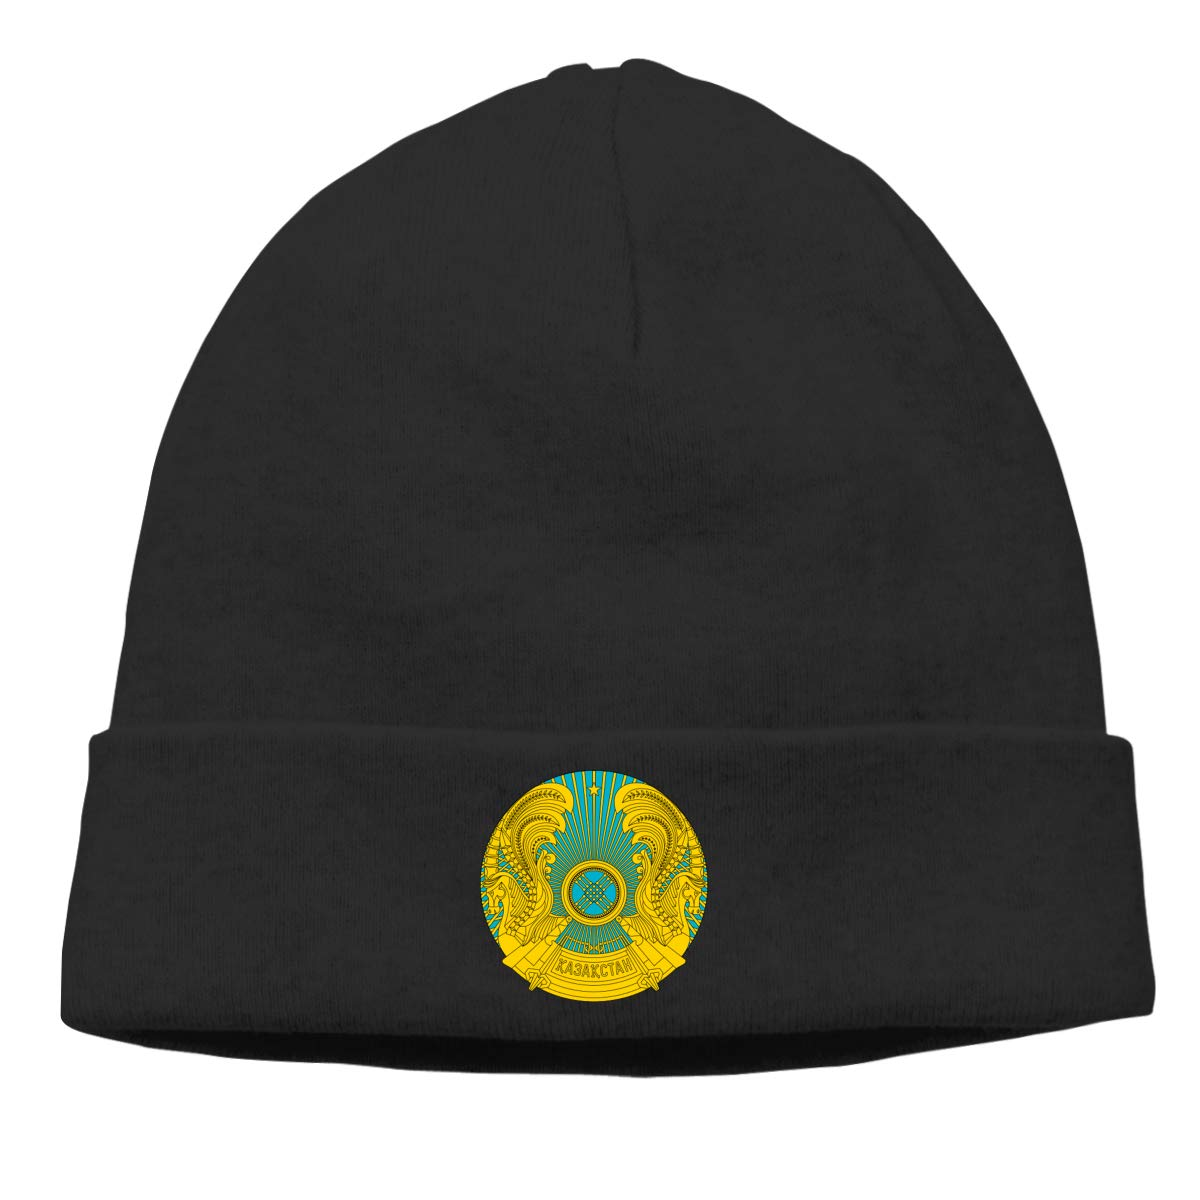 Nskngr Emblem of Kazakhstan Cap Men Winter Summer Chunky Knit Hat Cap Beanie Skull Cap